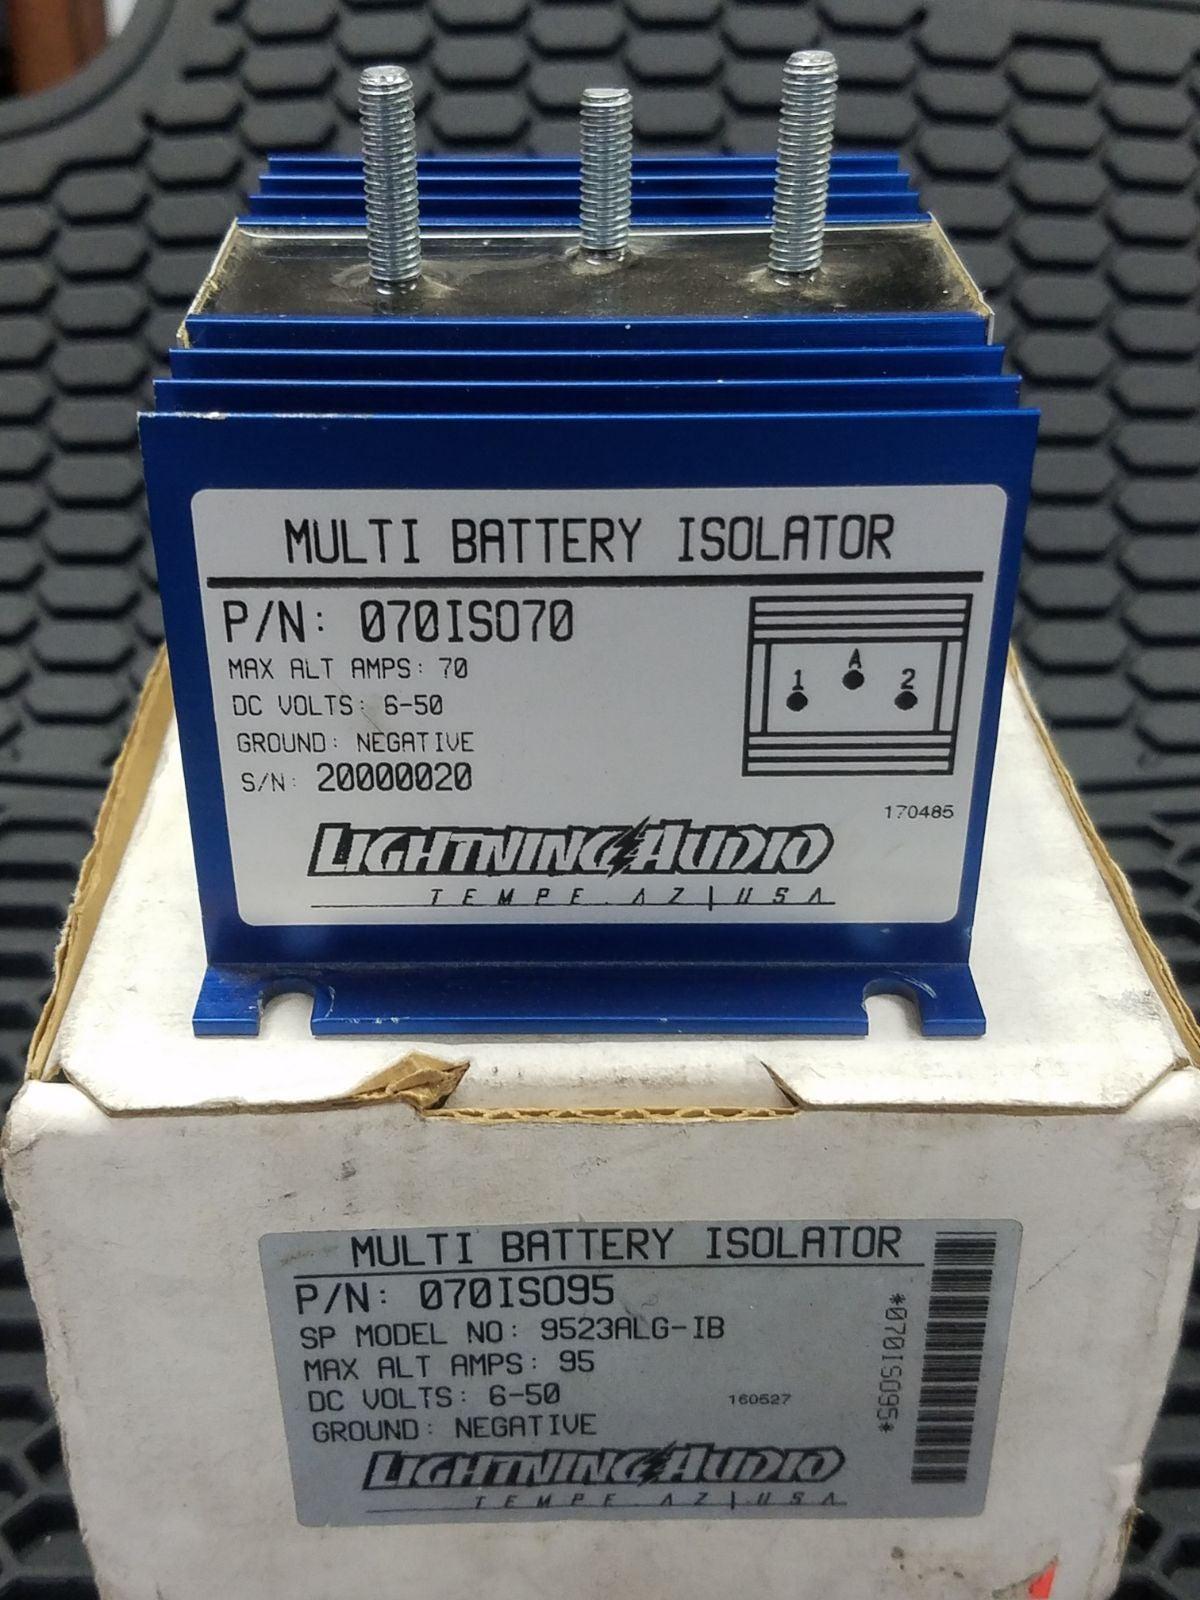 Multi battery isolator